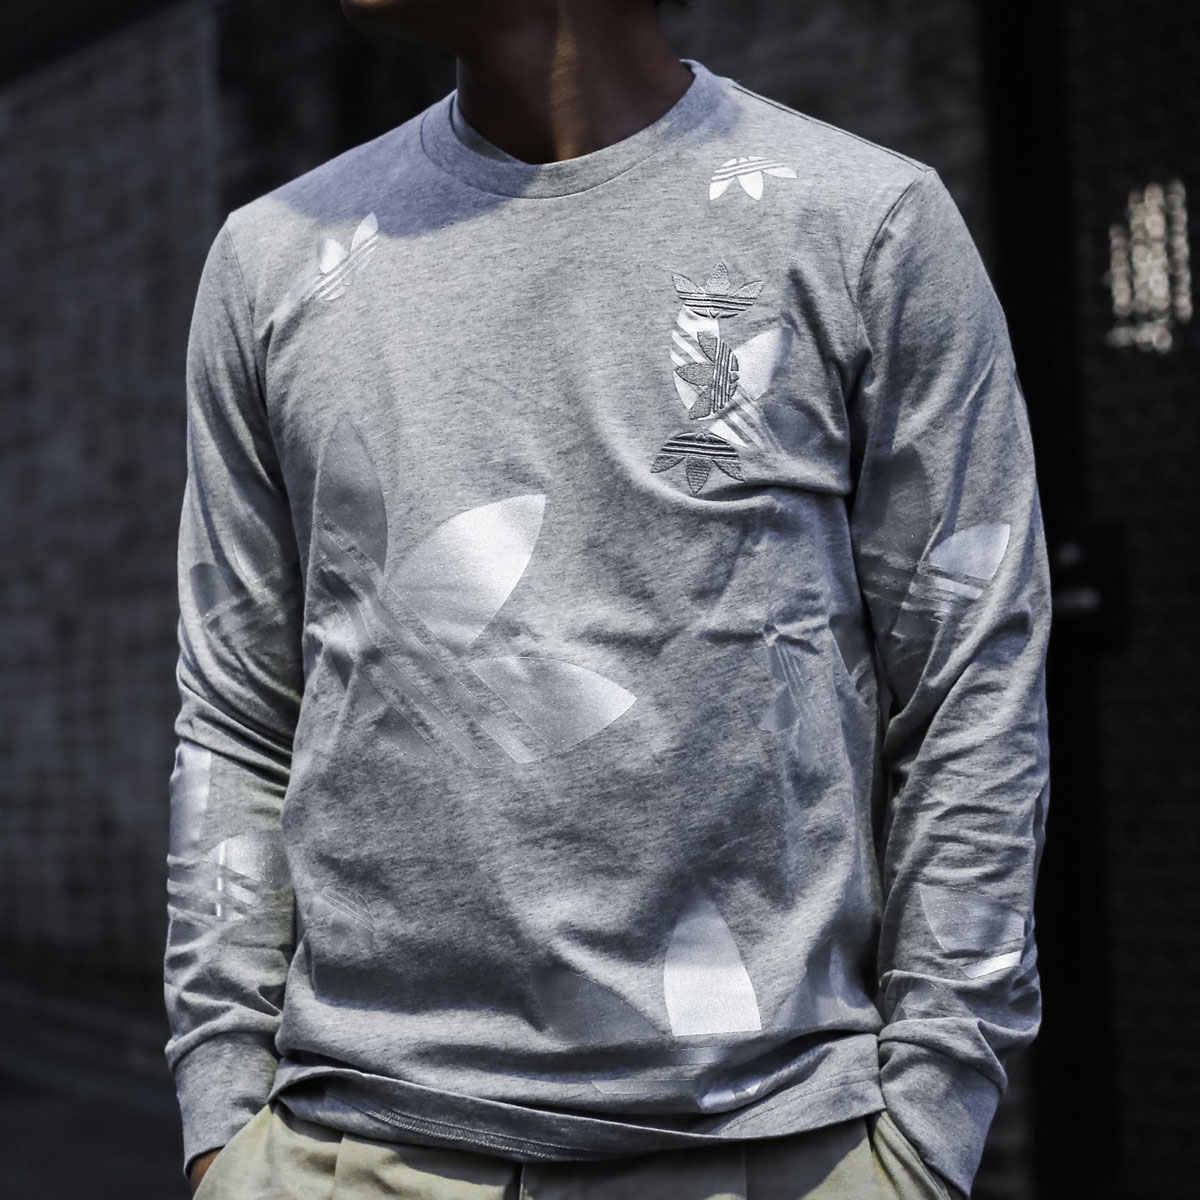 adidas REF/MET LS TEE(アディダス ロングスリーブ Tシャツ)MEDIUM GRAY FEATHER/SILVER METRIC【メンズ 長袖Tシャツ】20SS-S